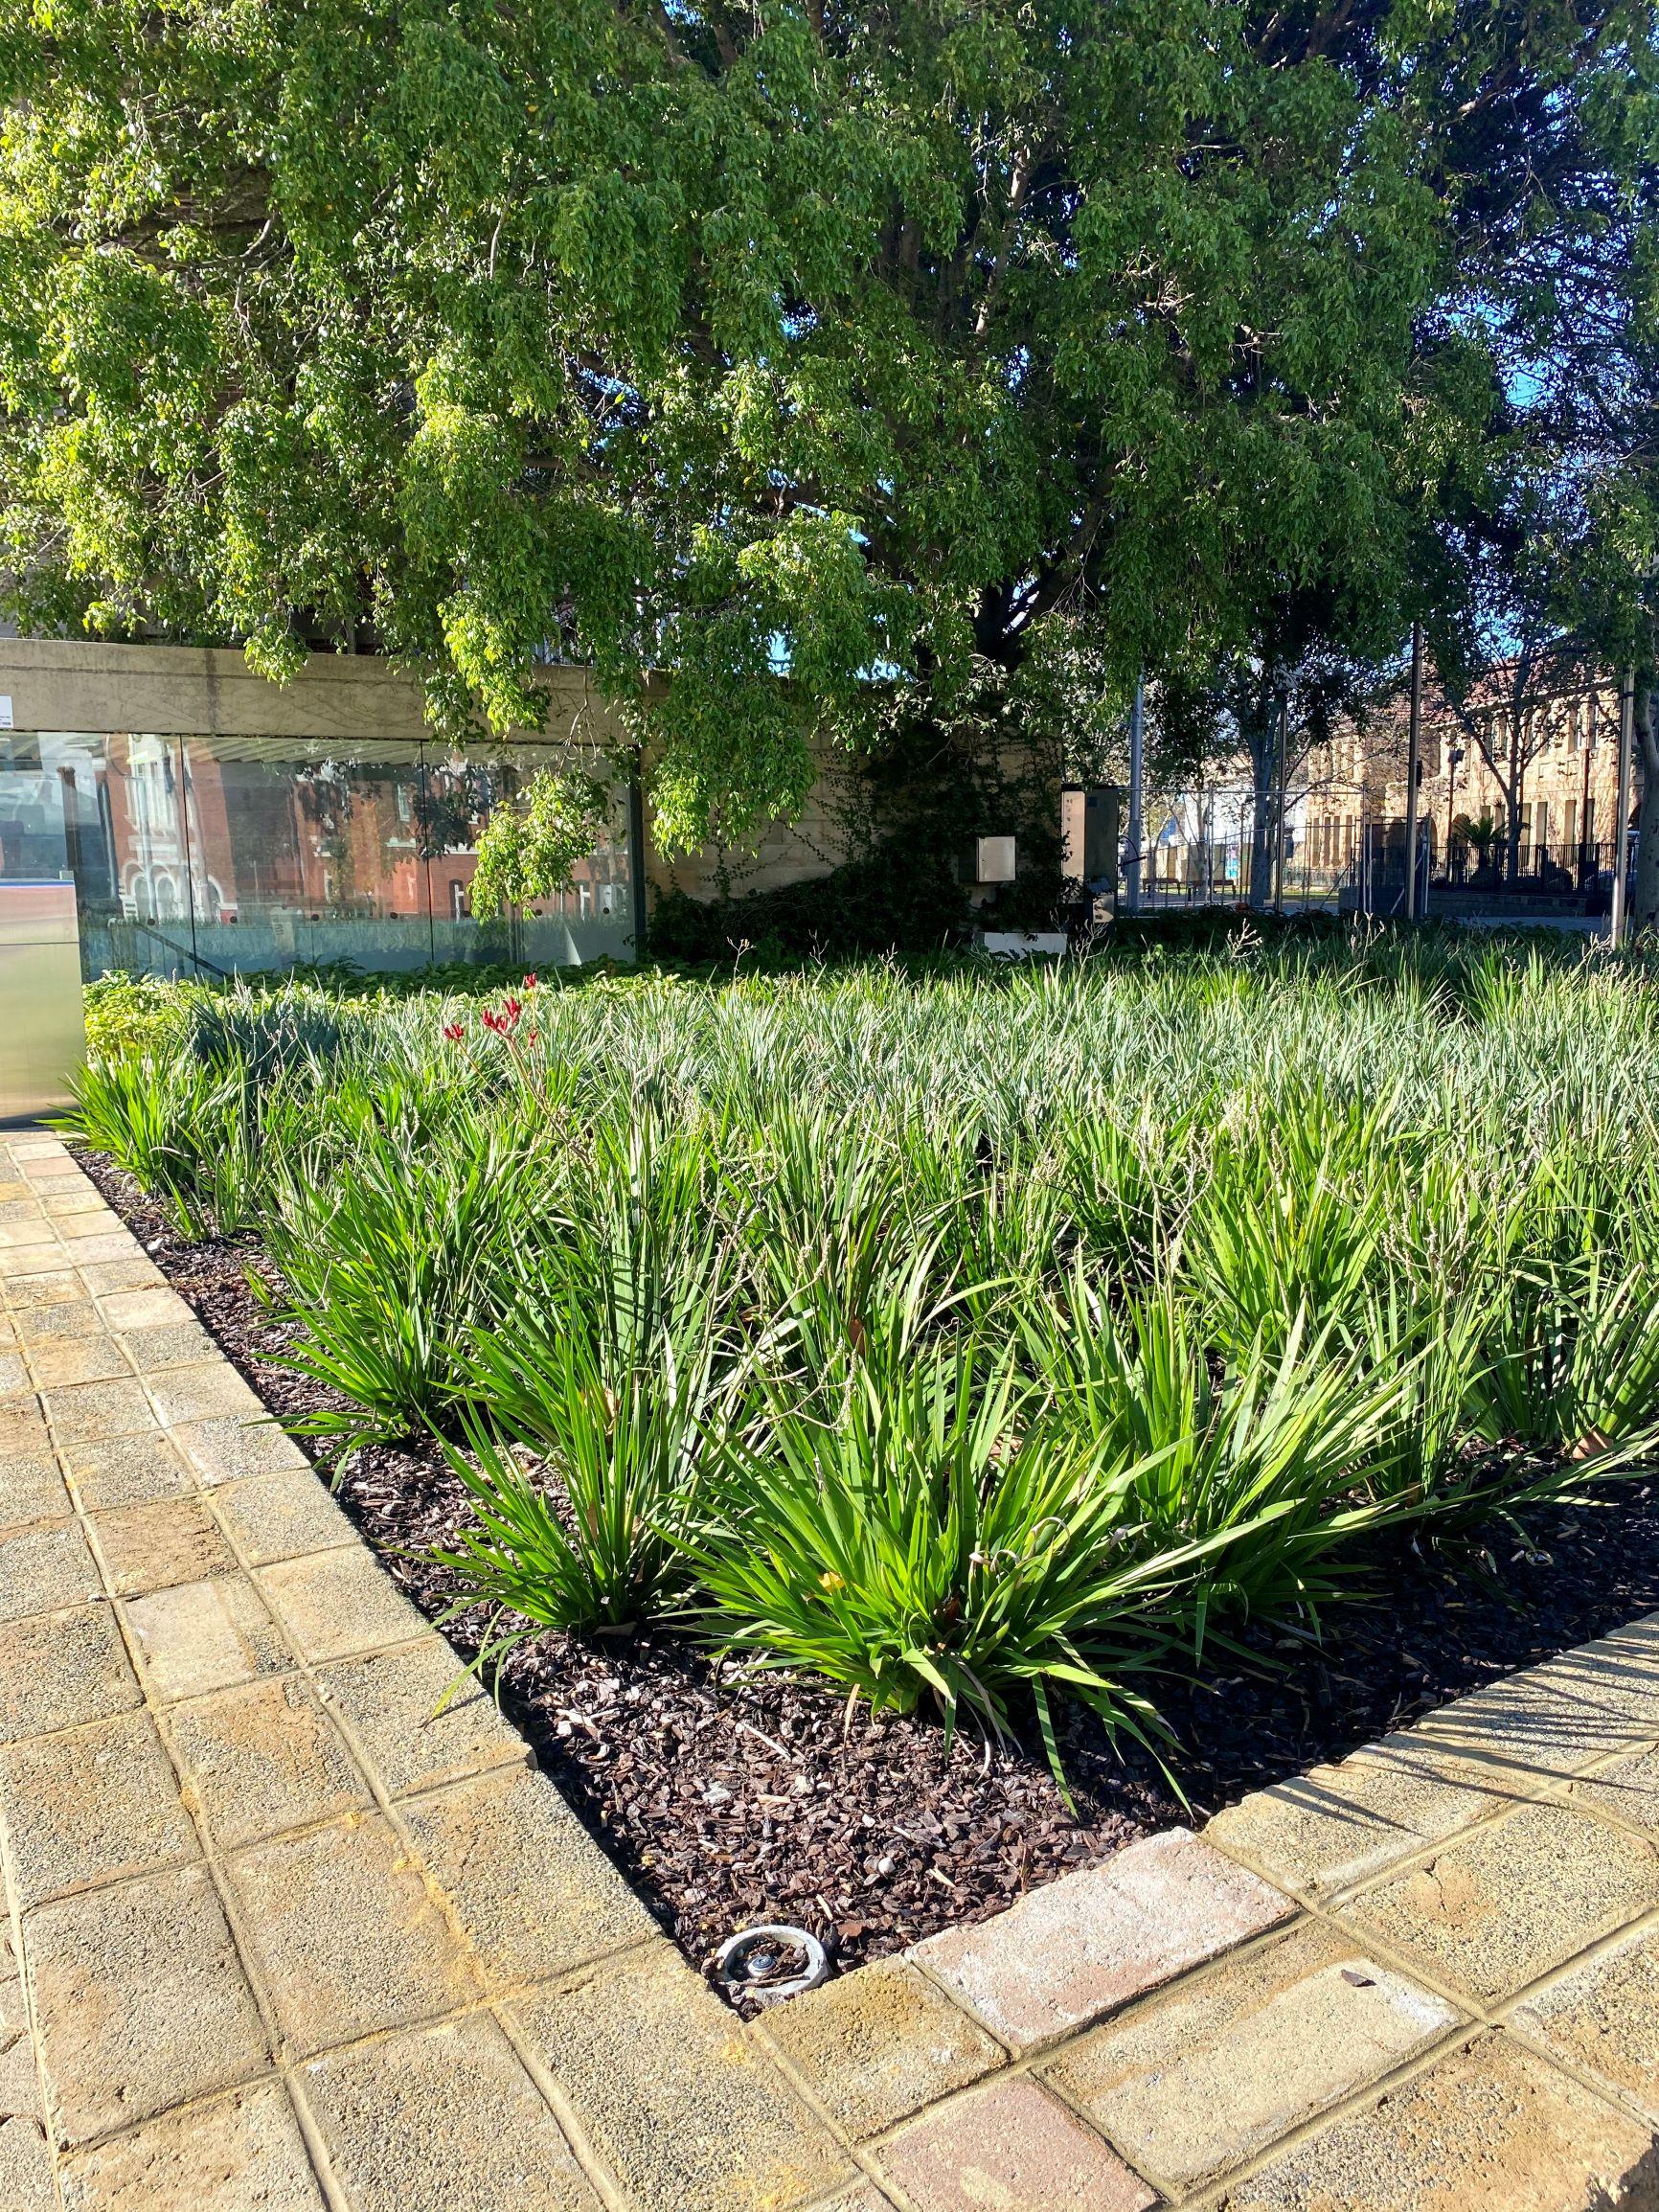 Perth Museum subsurface drip irrigation installation garden bed 3